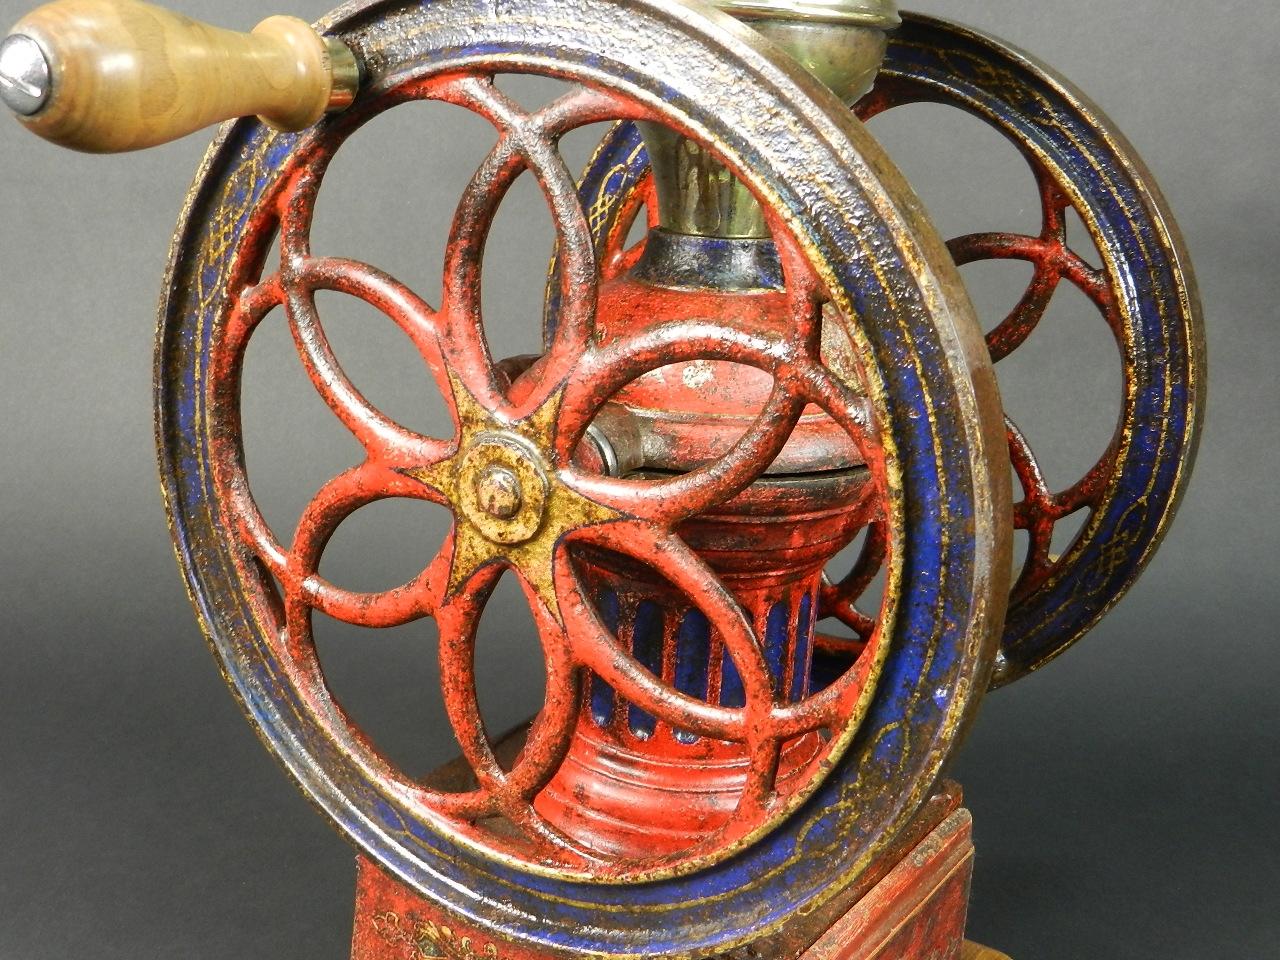 Imagen MOLINILLO CAFE J.M.B Nº1 AÑO 1890 38289